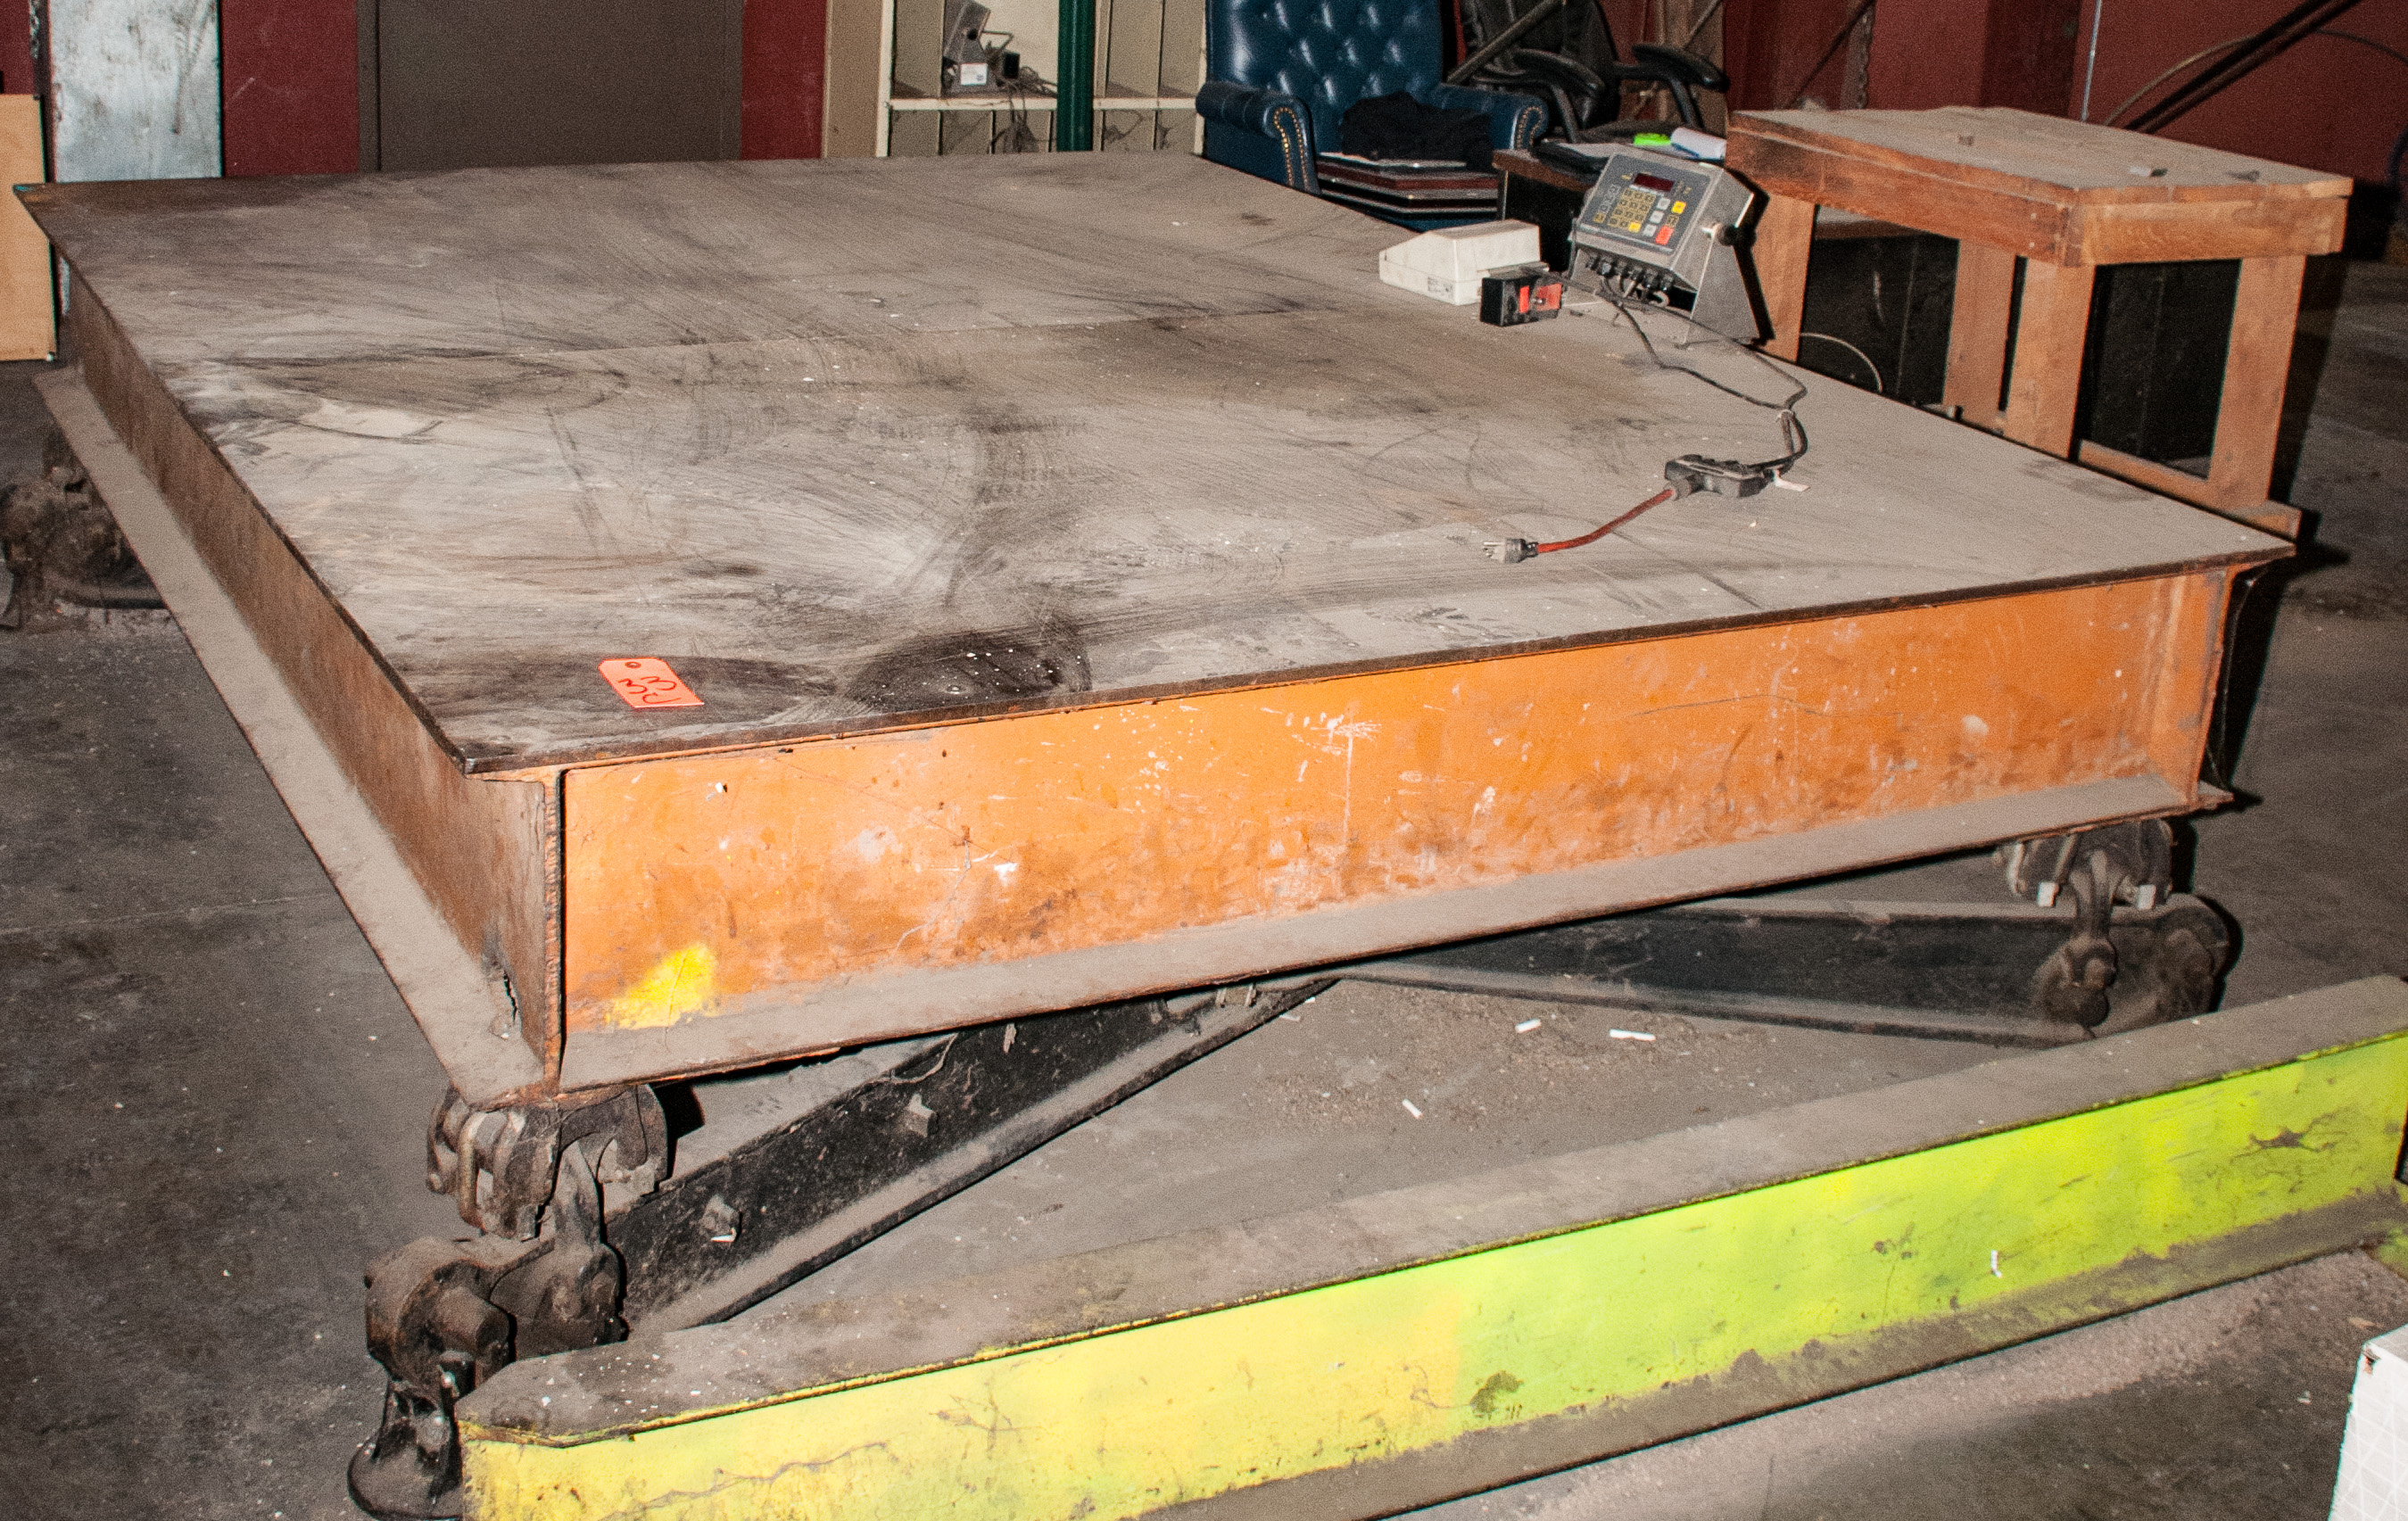 "Scale Table 82 1/2"" X 107 1/2"" w/ Fairbanks Readout and Epson Printer, 10,000 lb. Cap."